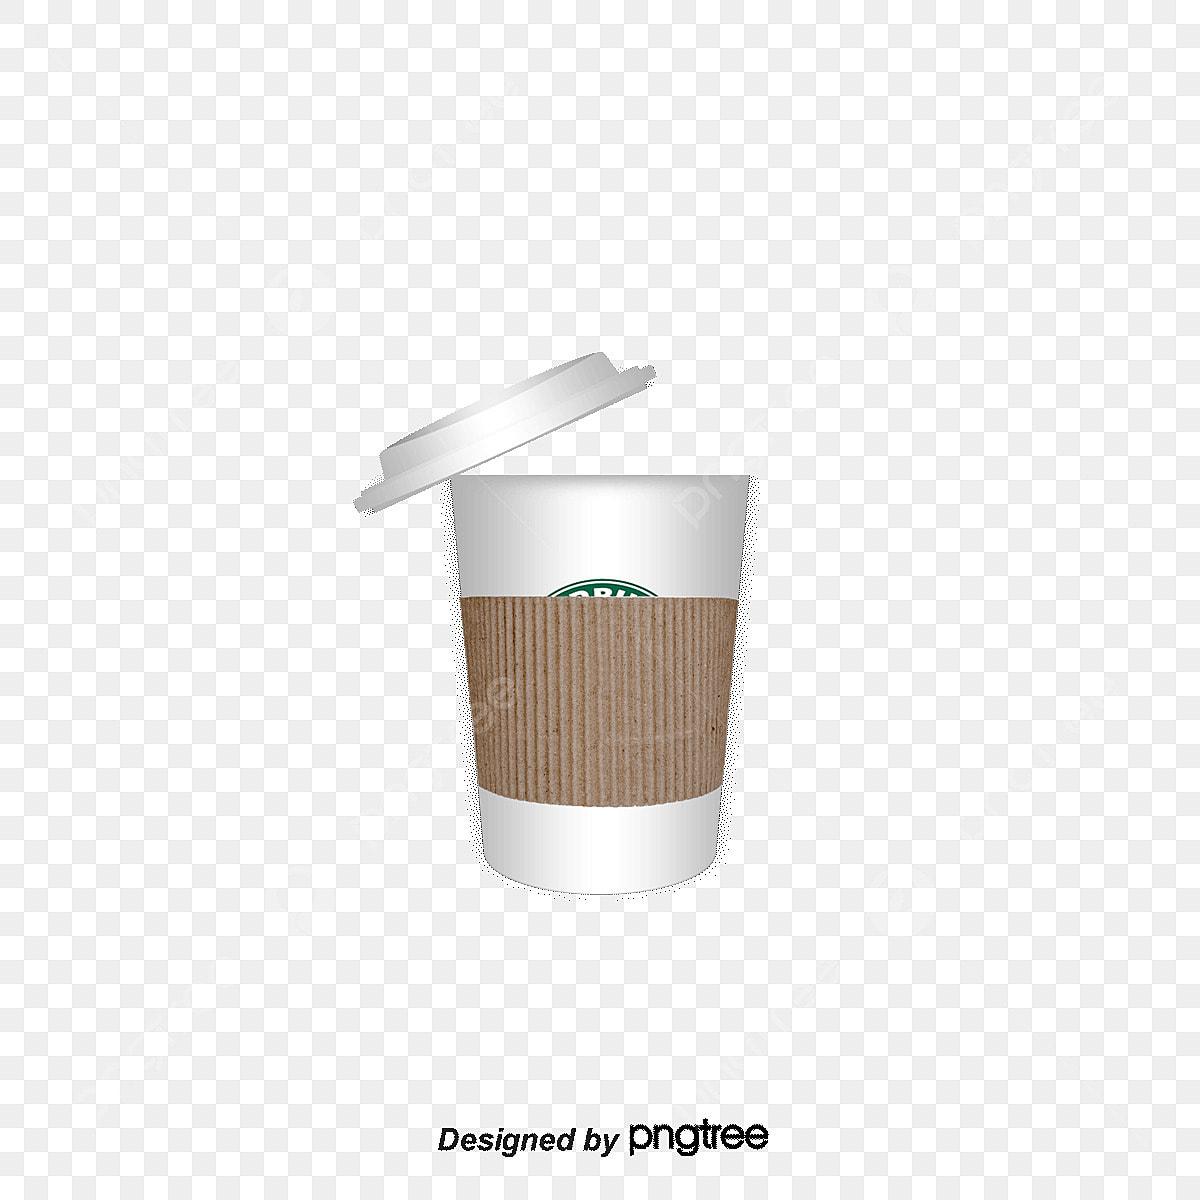 Starbucks Coffee Cup Starbucks Coffee Drink Png